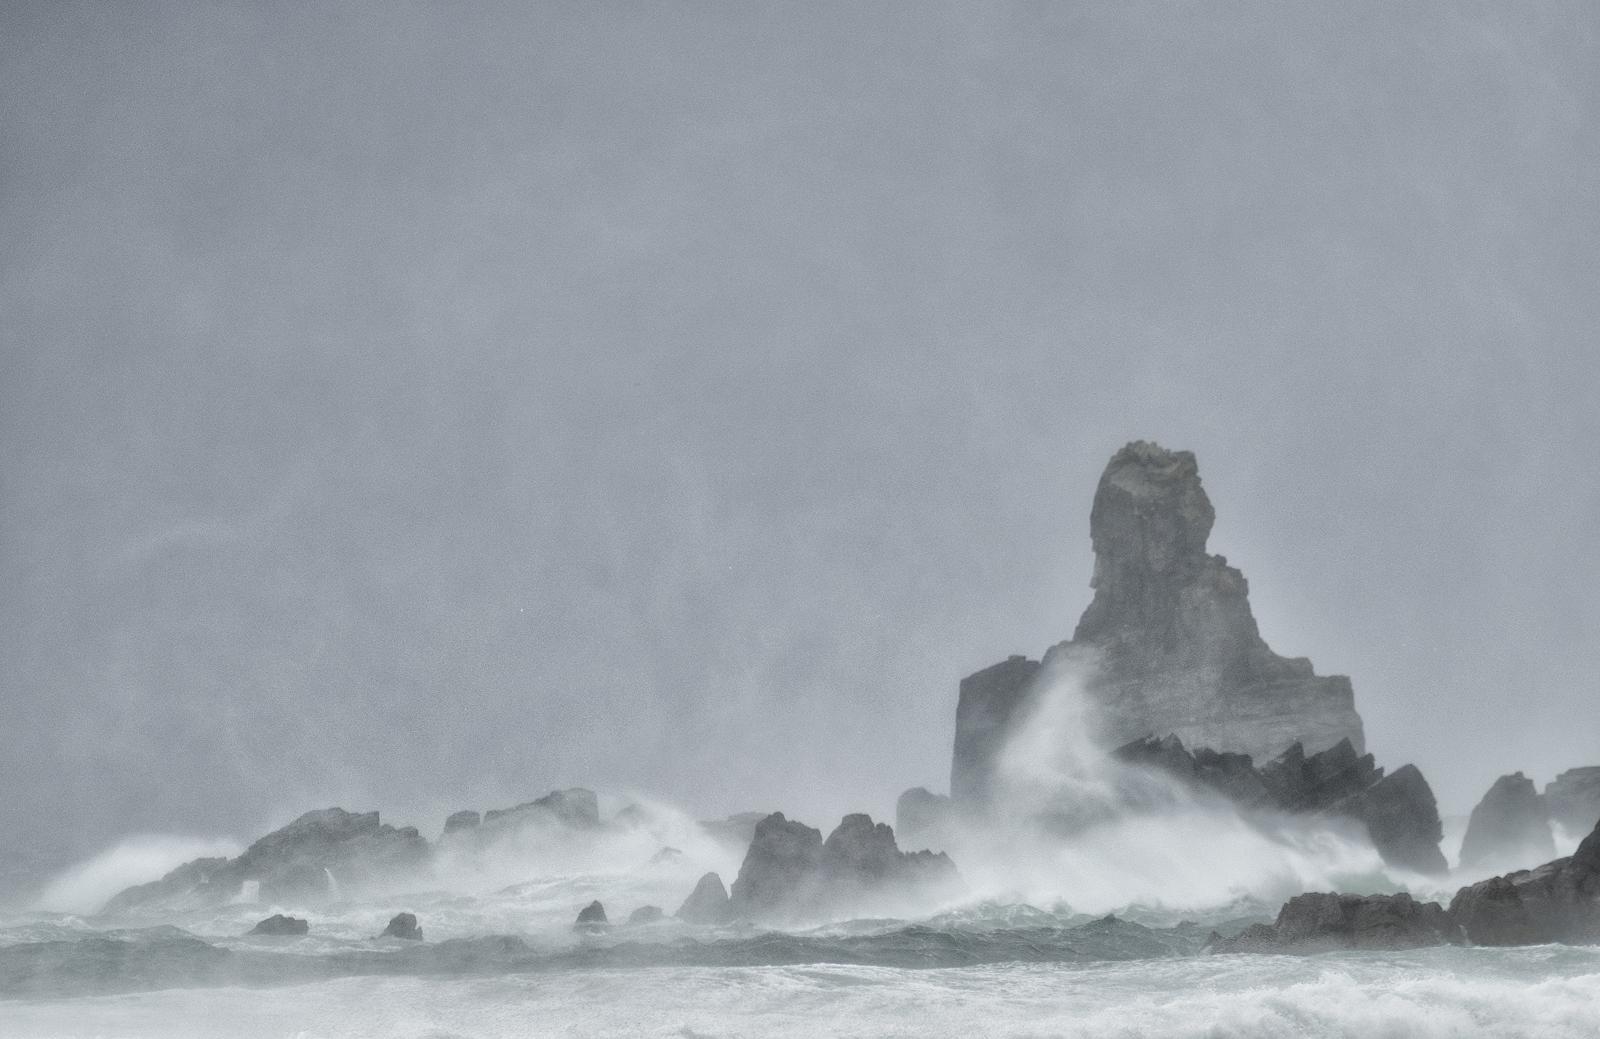 Stormy Dalmore Beach, Isle of Lewis